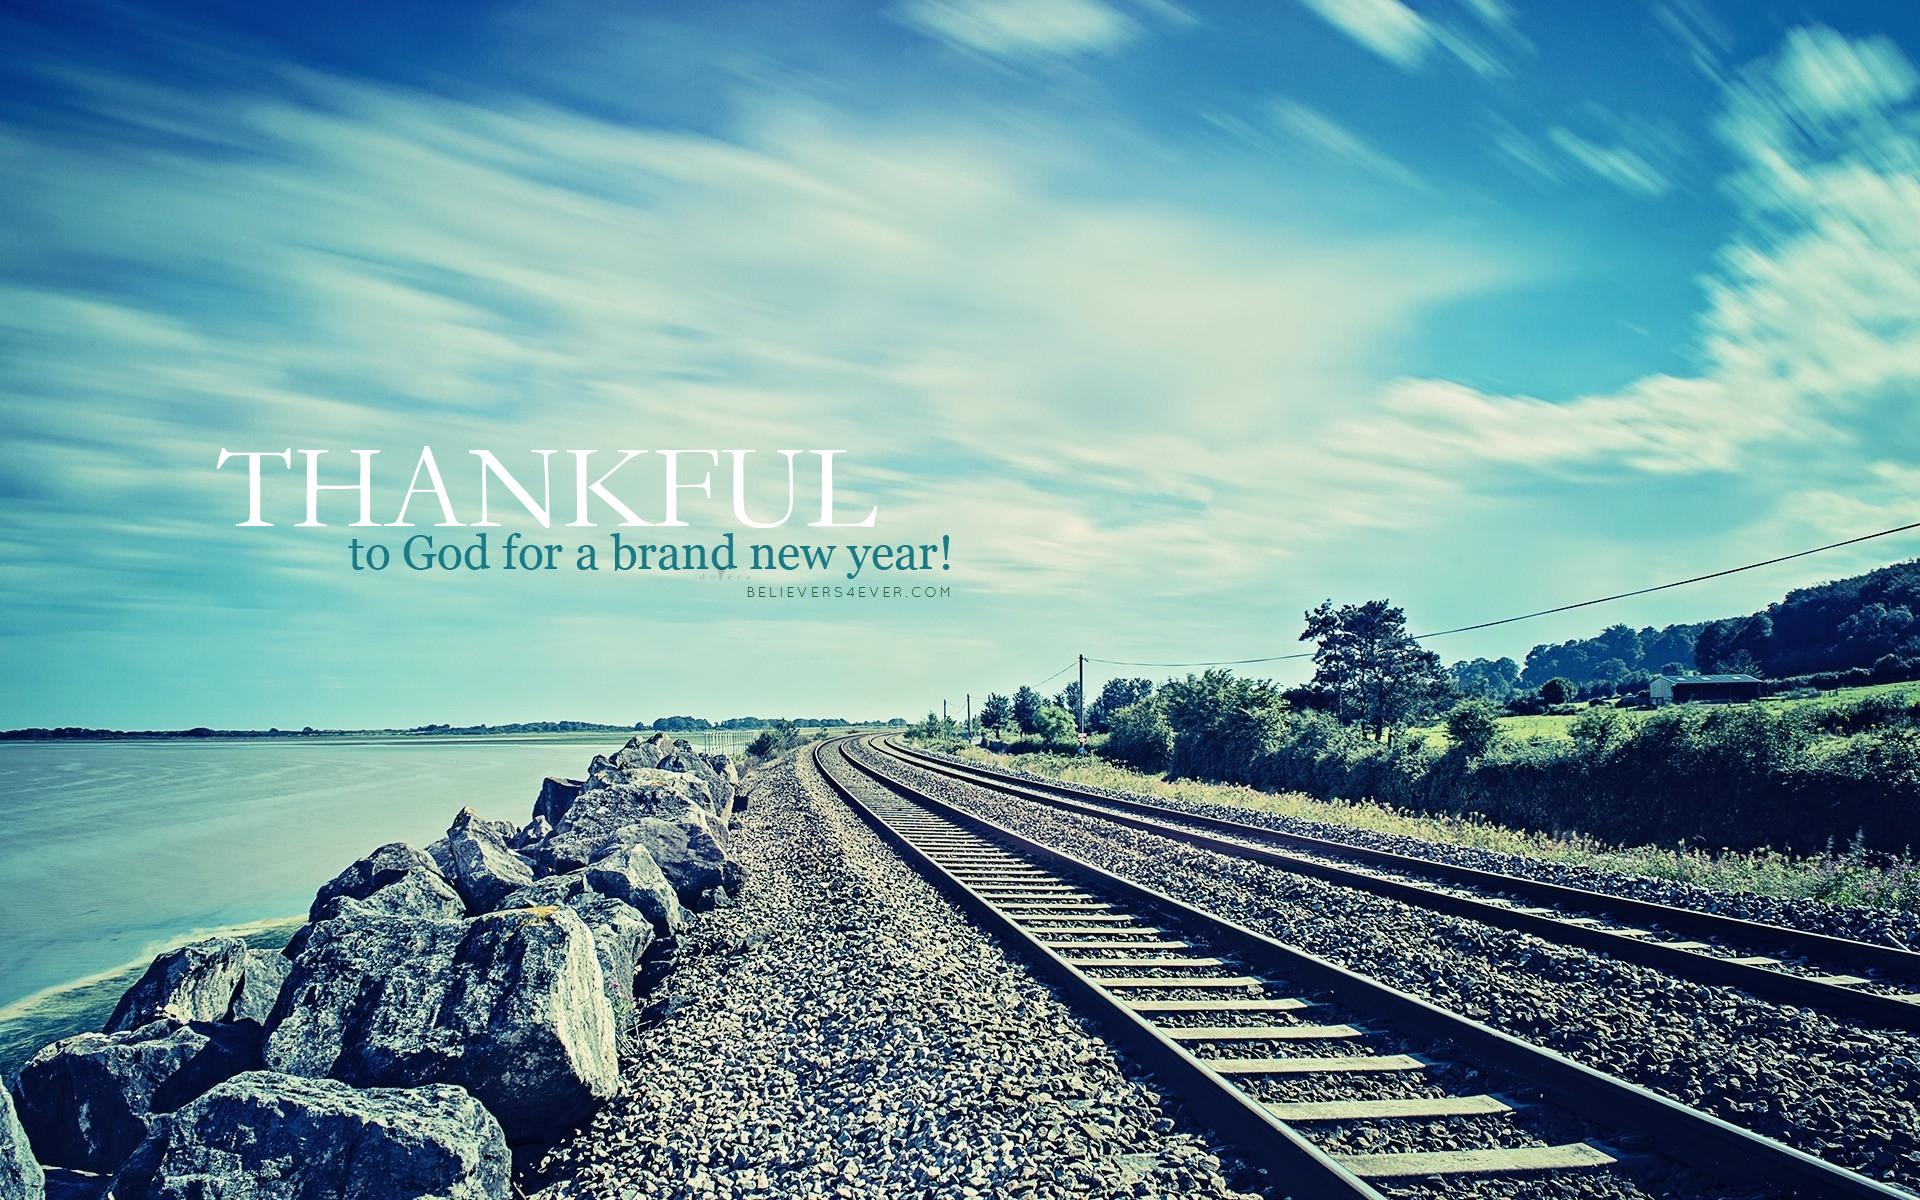 Thankful new year 2015 Christian wallpaper 1920x1200